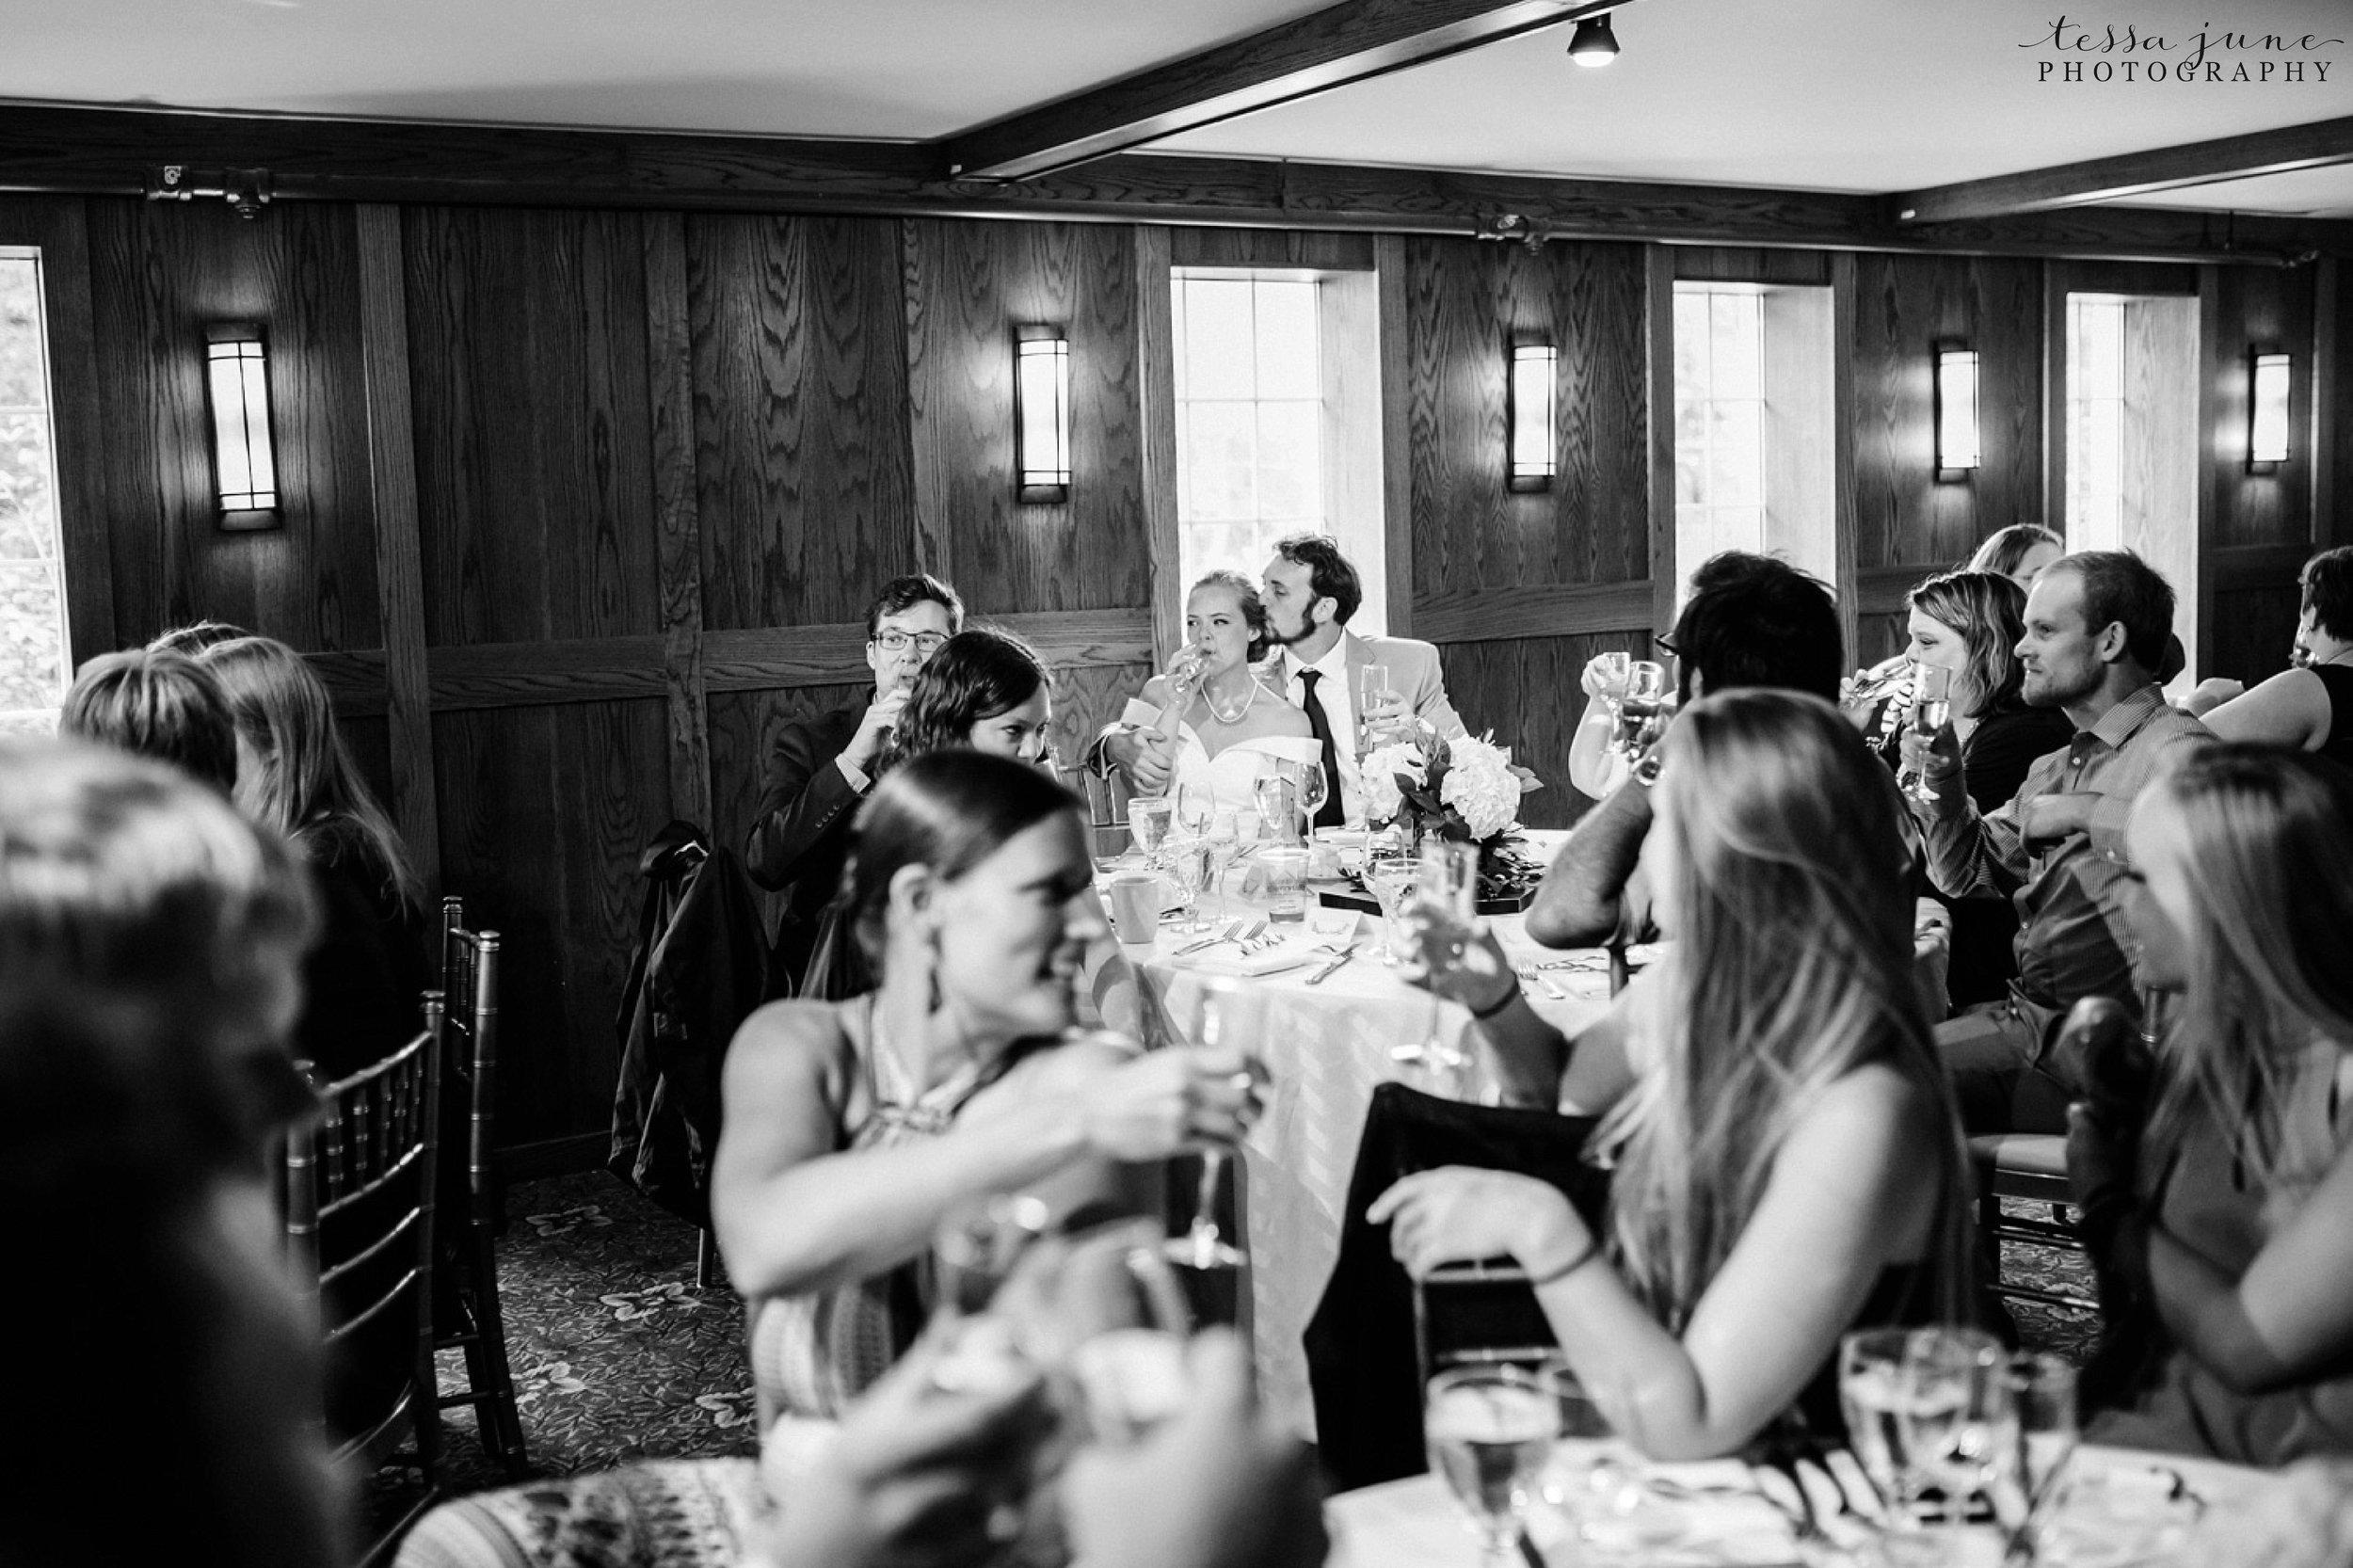 grandview-lodge-intimate-wedding-nisswa-minnesota_0096.jpg